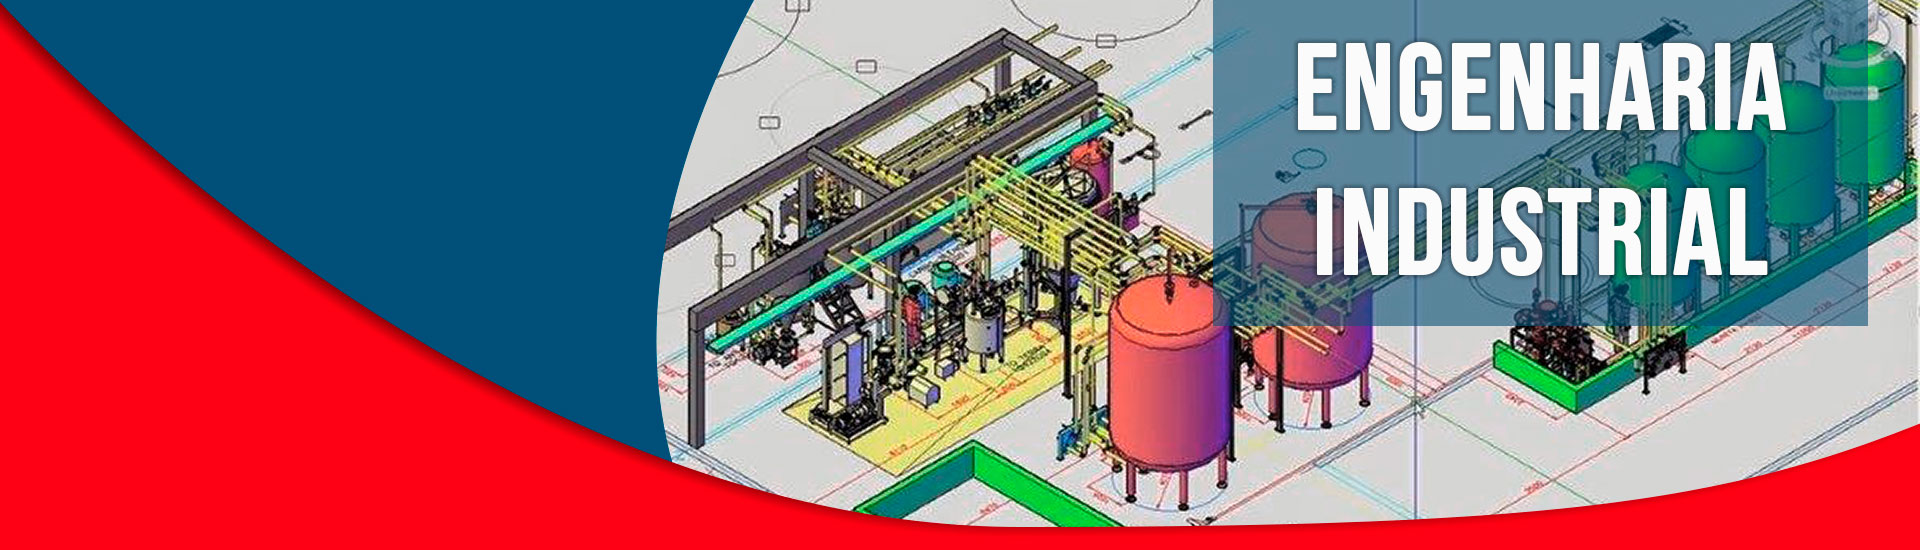 Slider Engenharia Industrial